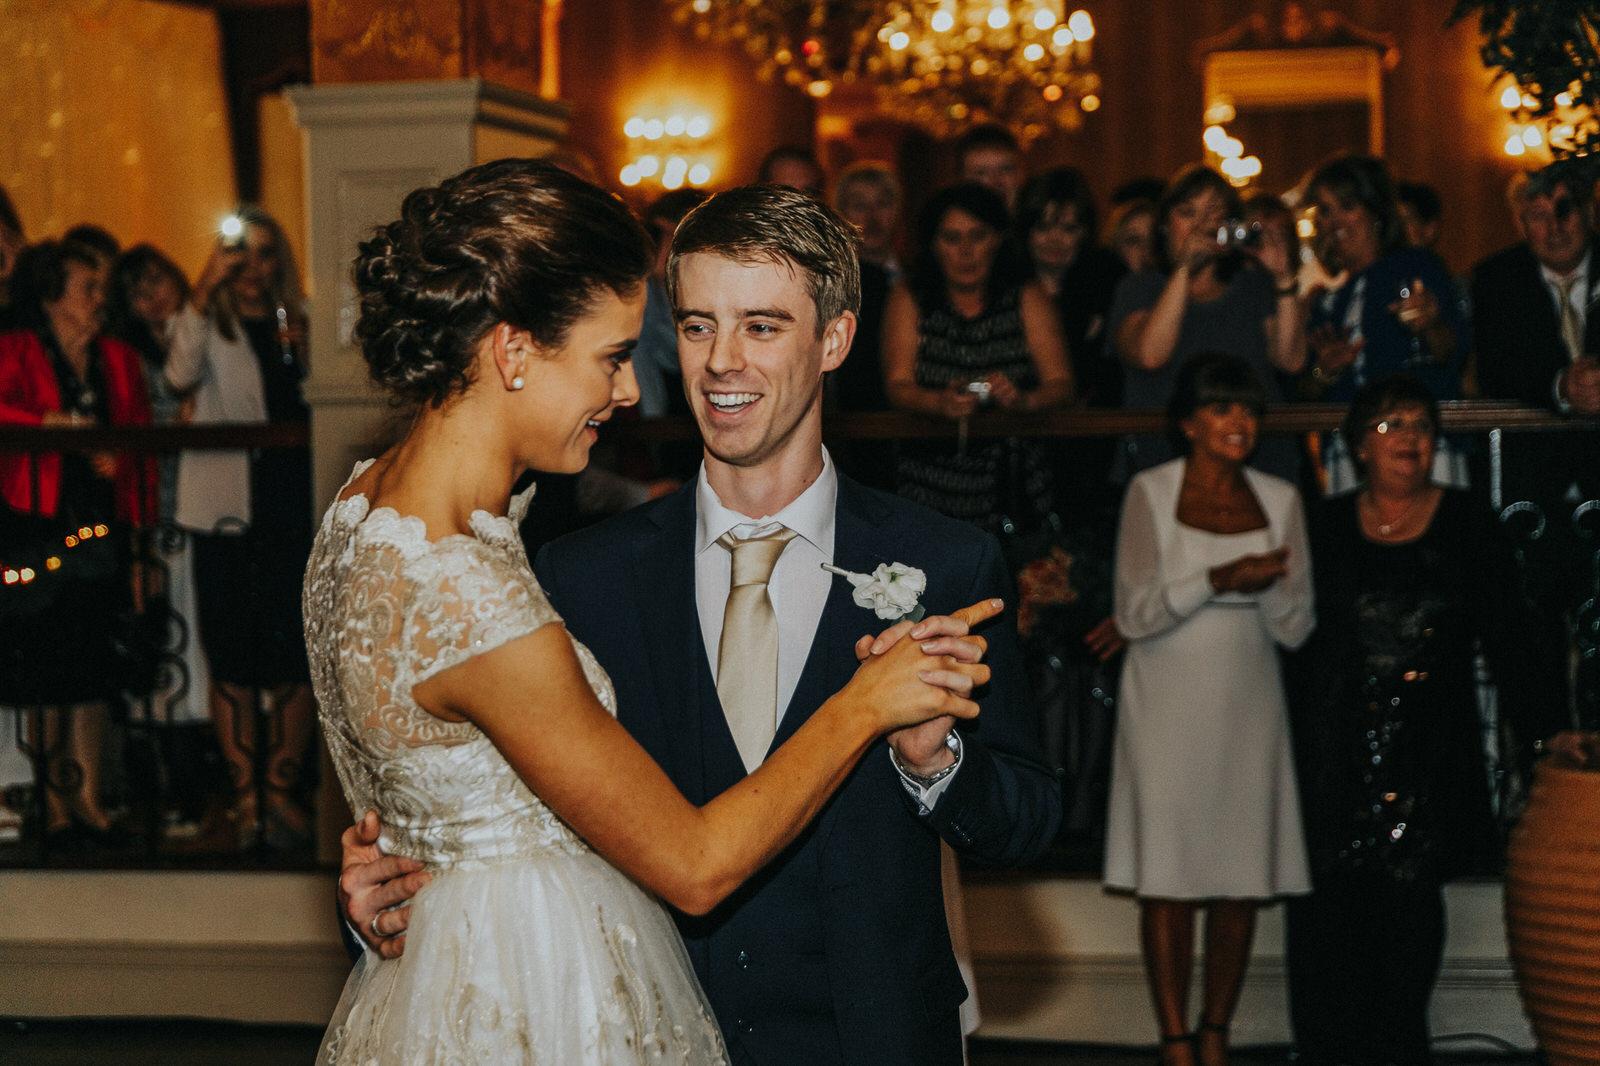 Roger_Kenny_wedding_photographer_519.jpg